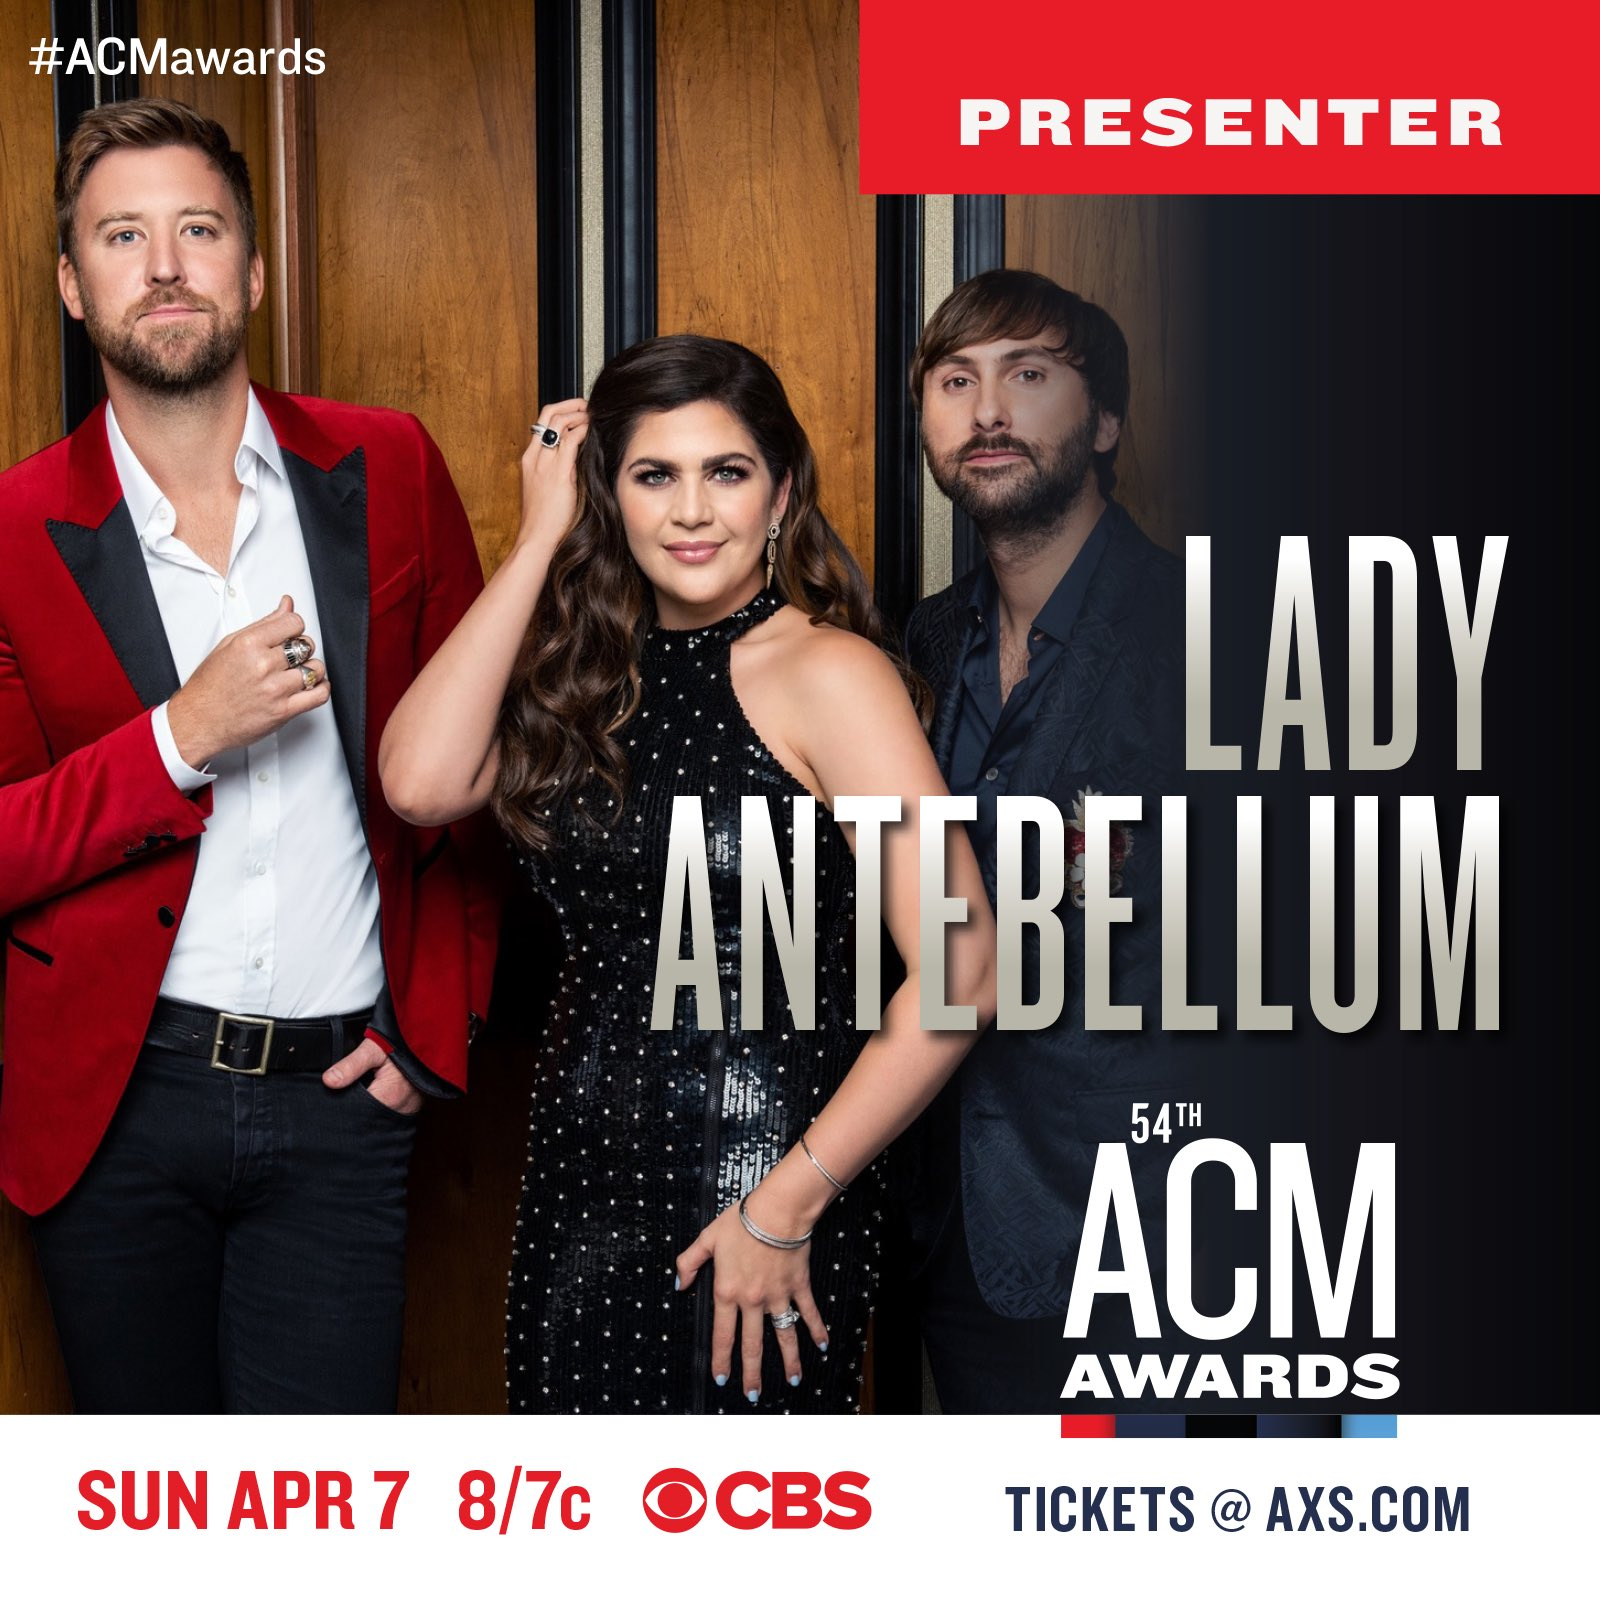 Lady Antebellum @ ladyantebellum